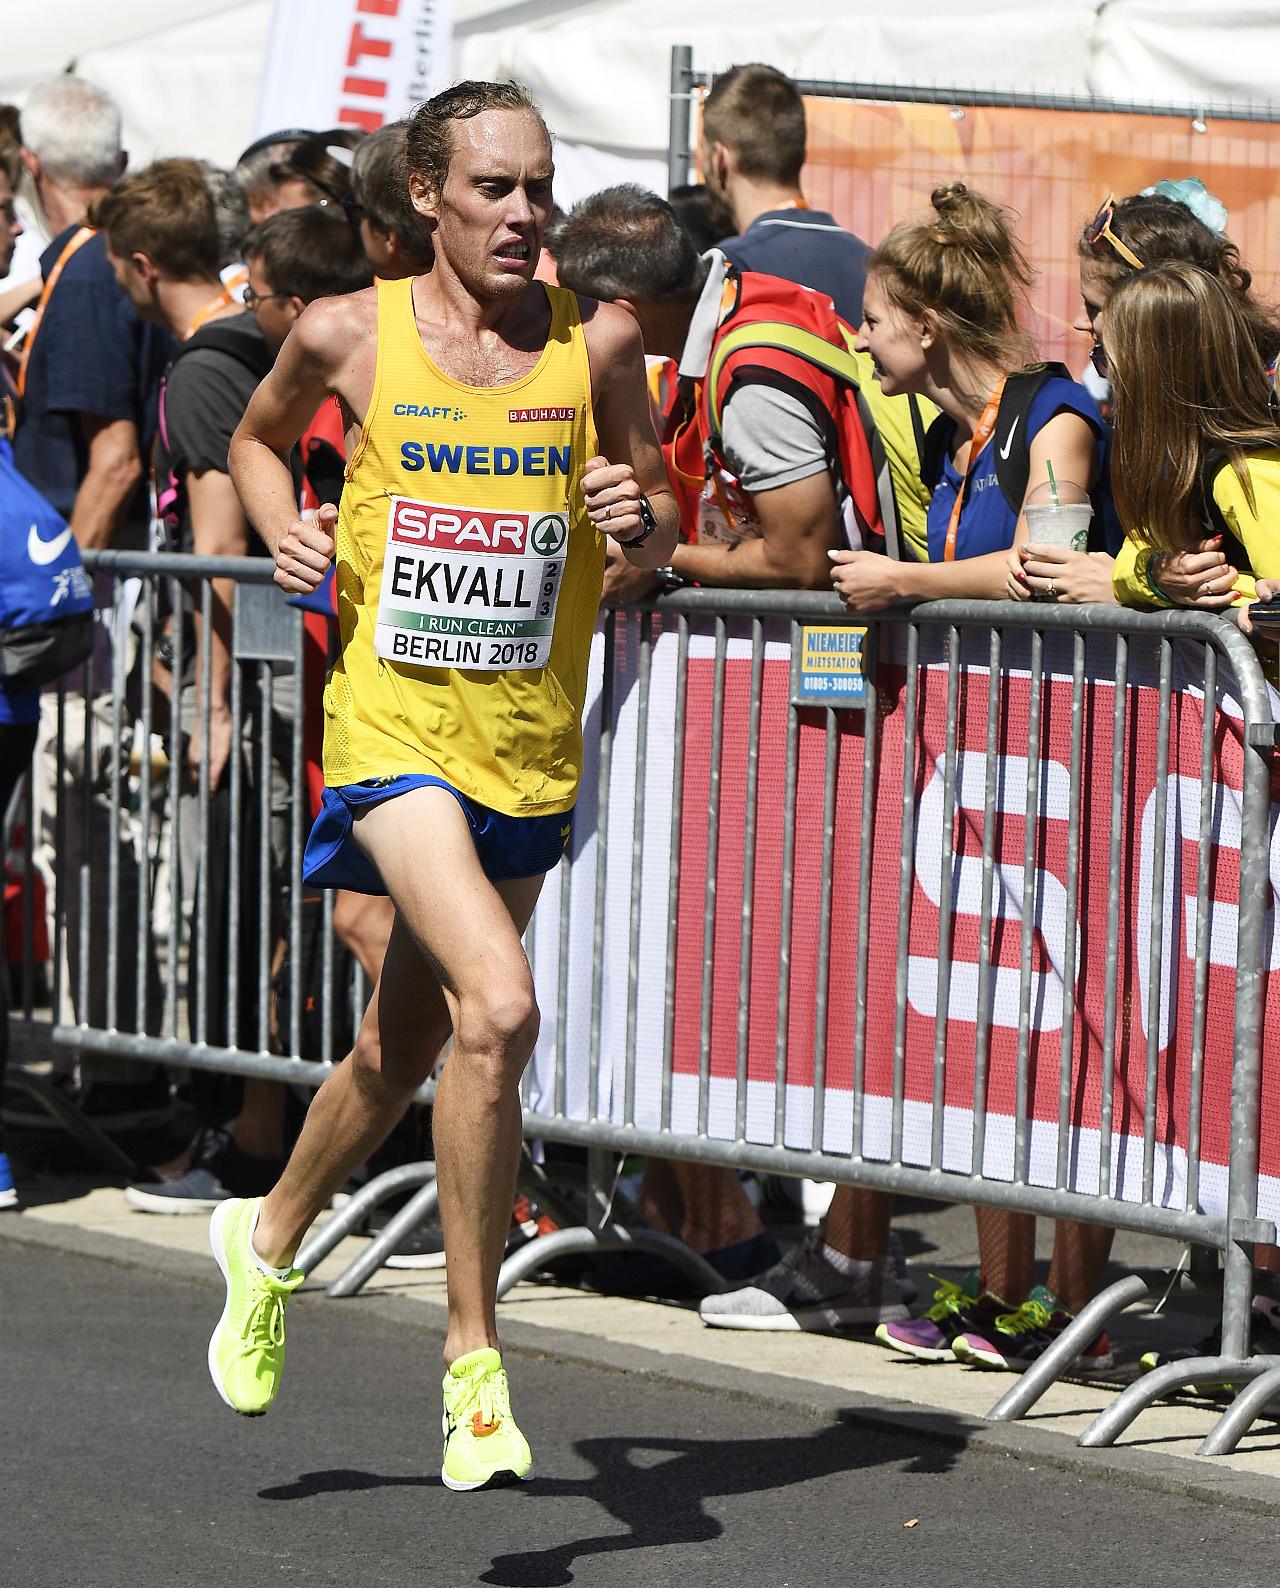 maraton-menn-ekvall-30km_50D7998.jpg